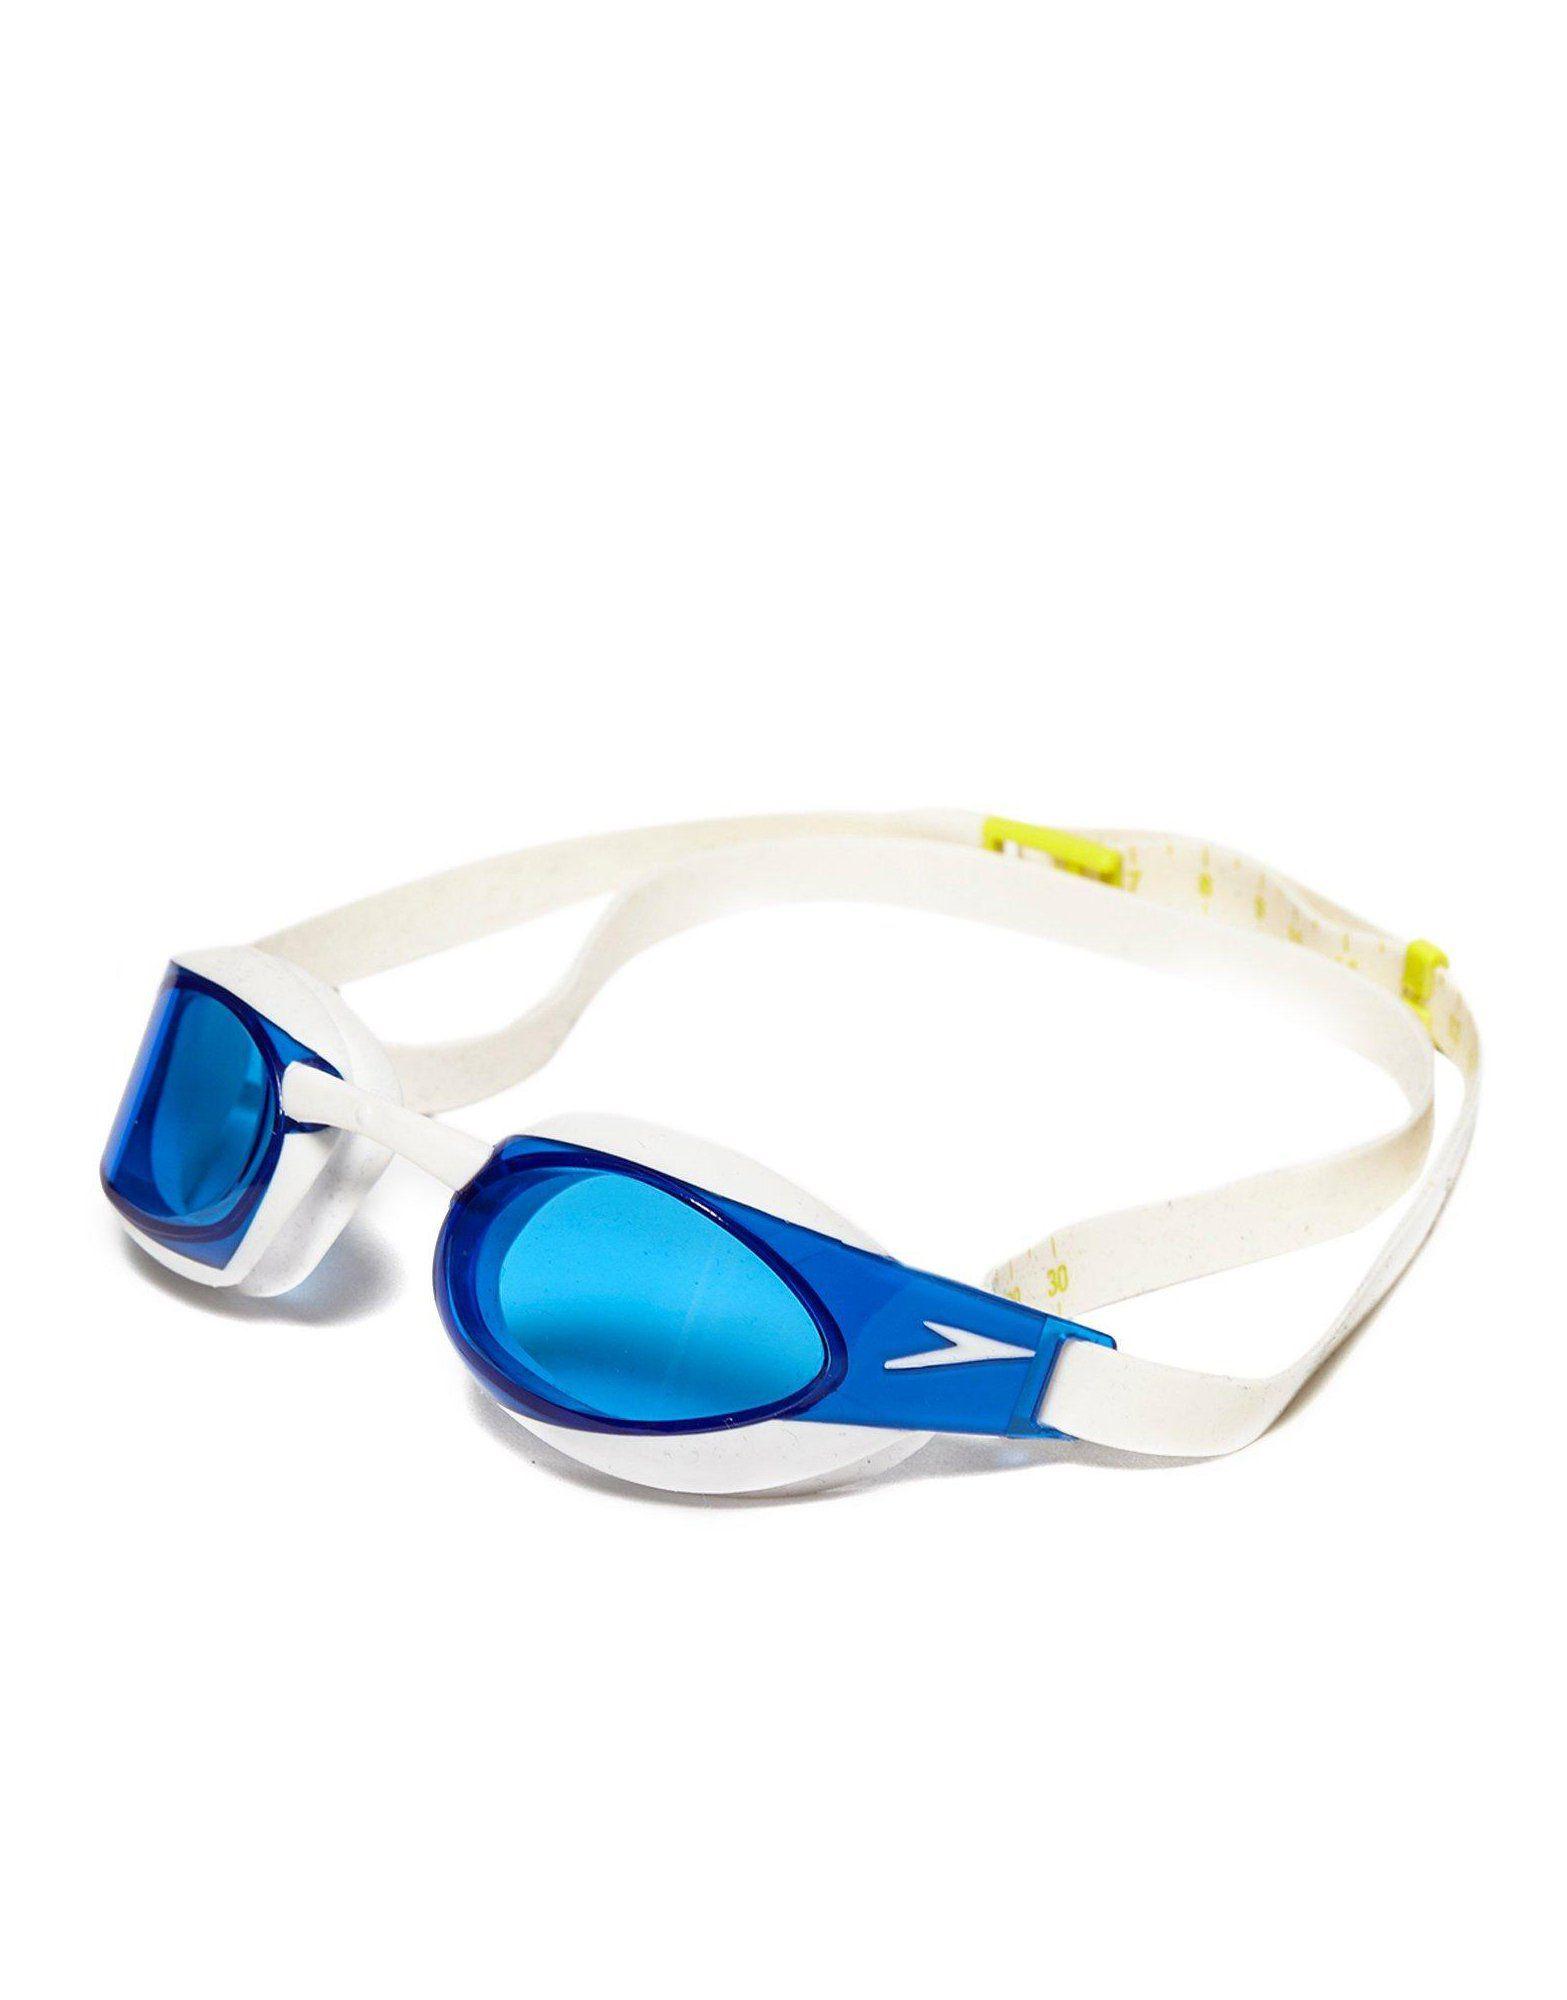 Fastskin3 Elite Goggles